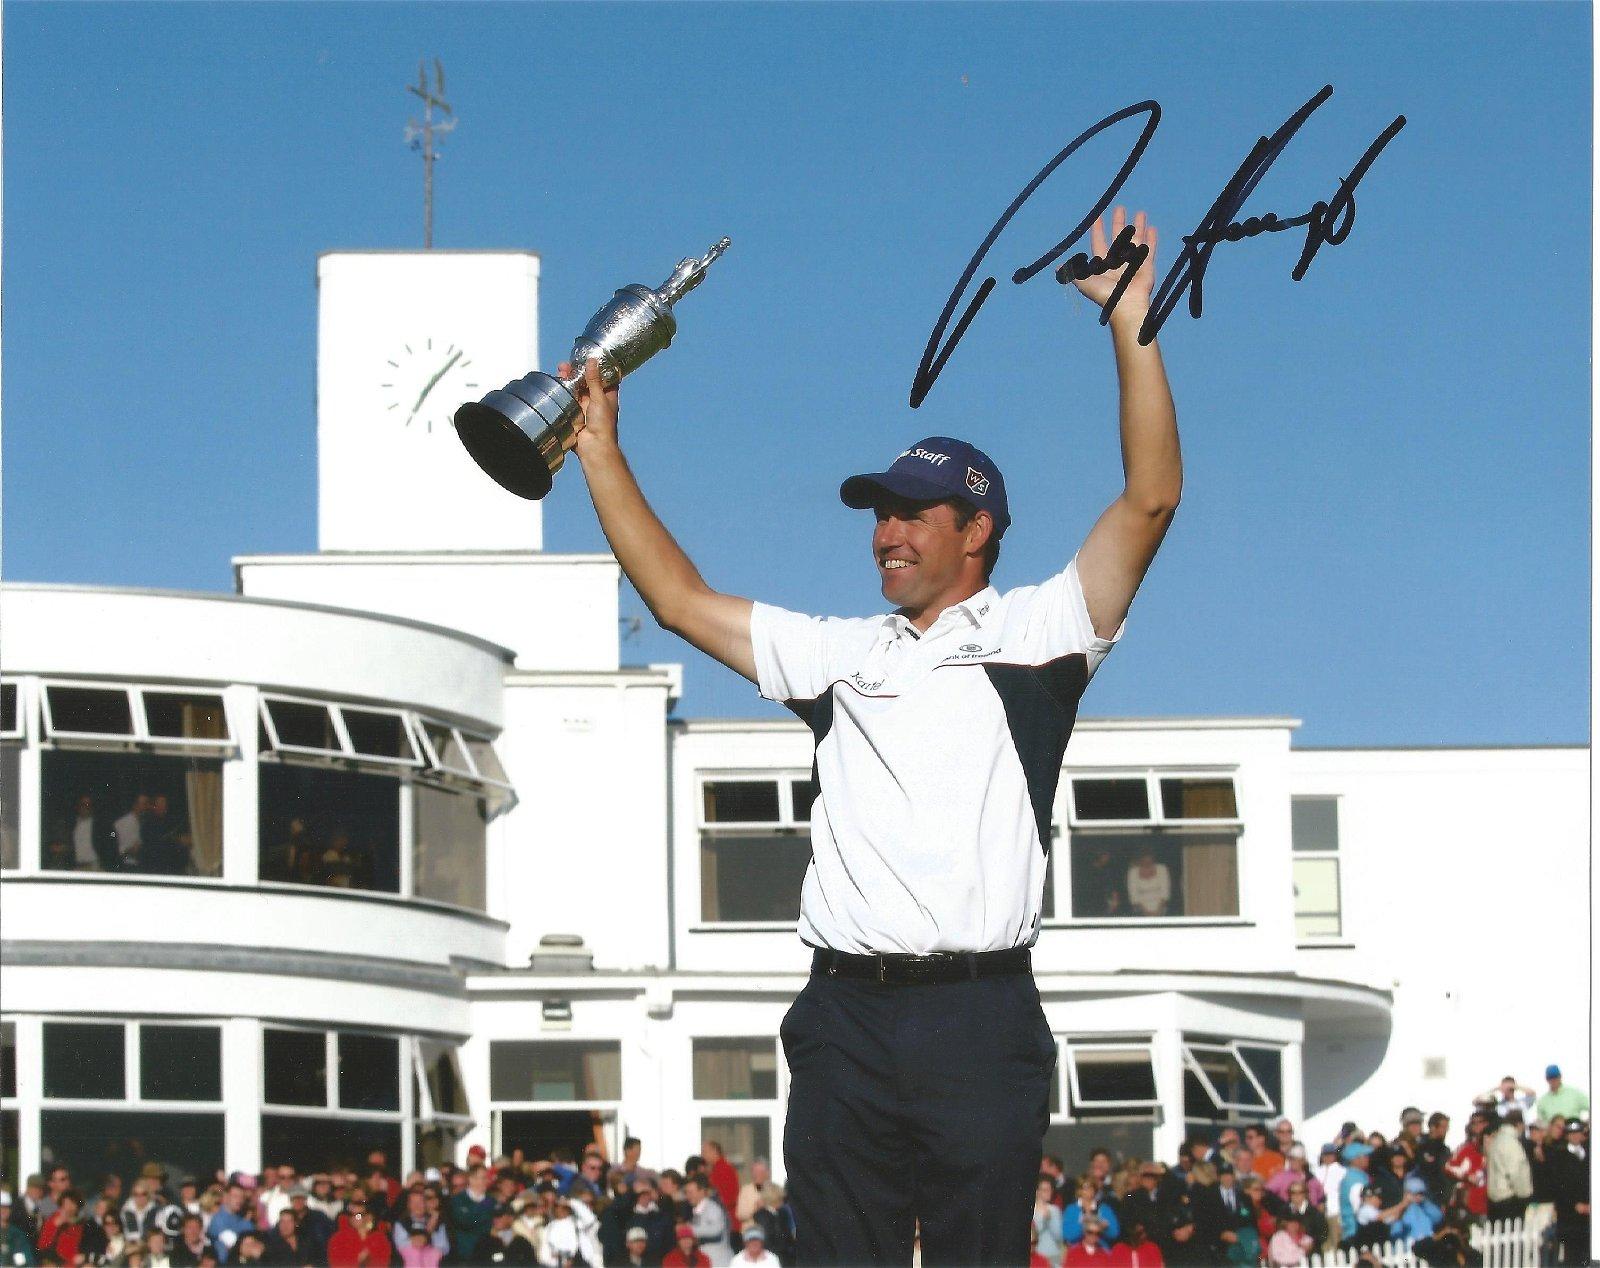 Padraig Harrington Signed British Open Golf 8x10 Photo